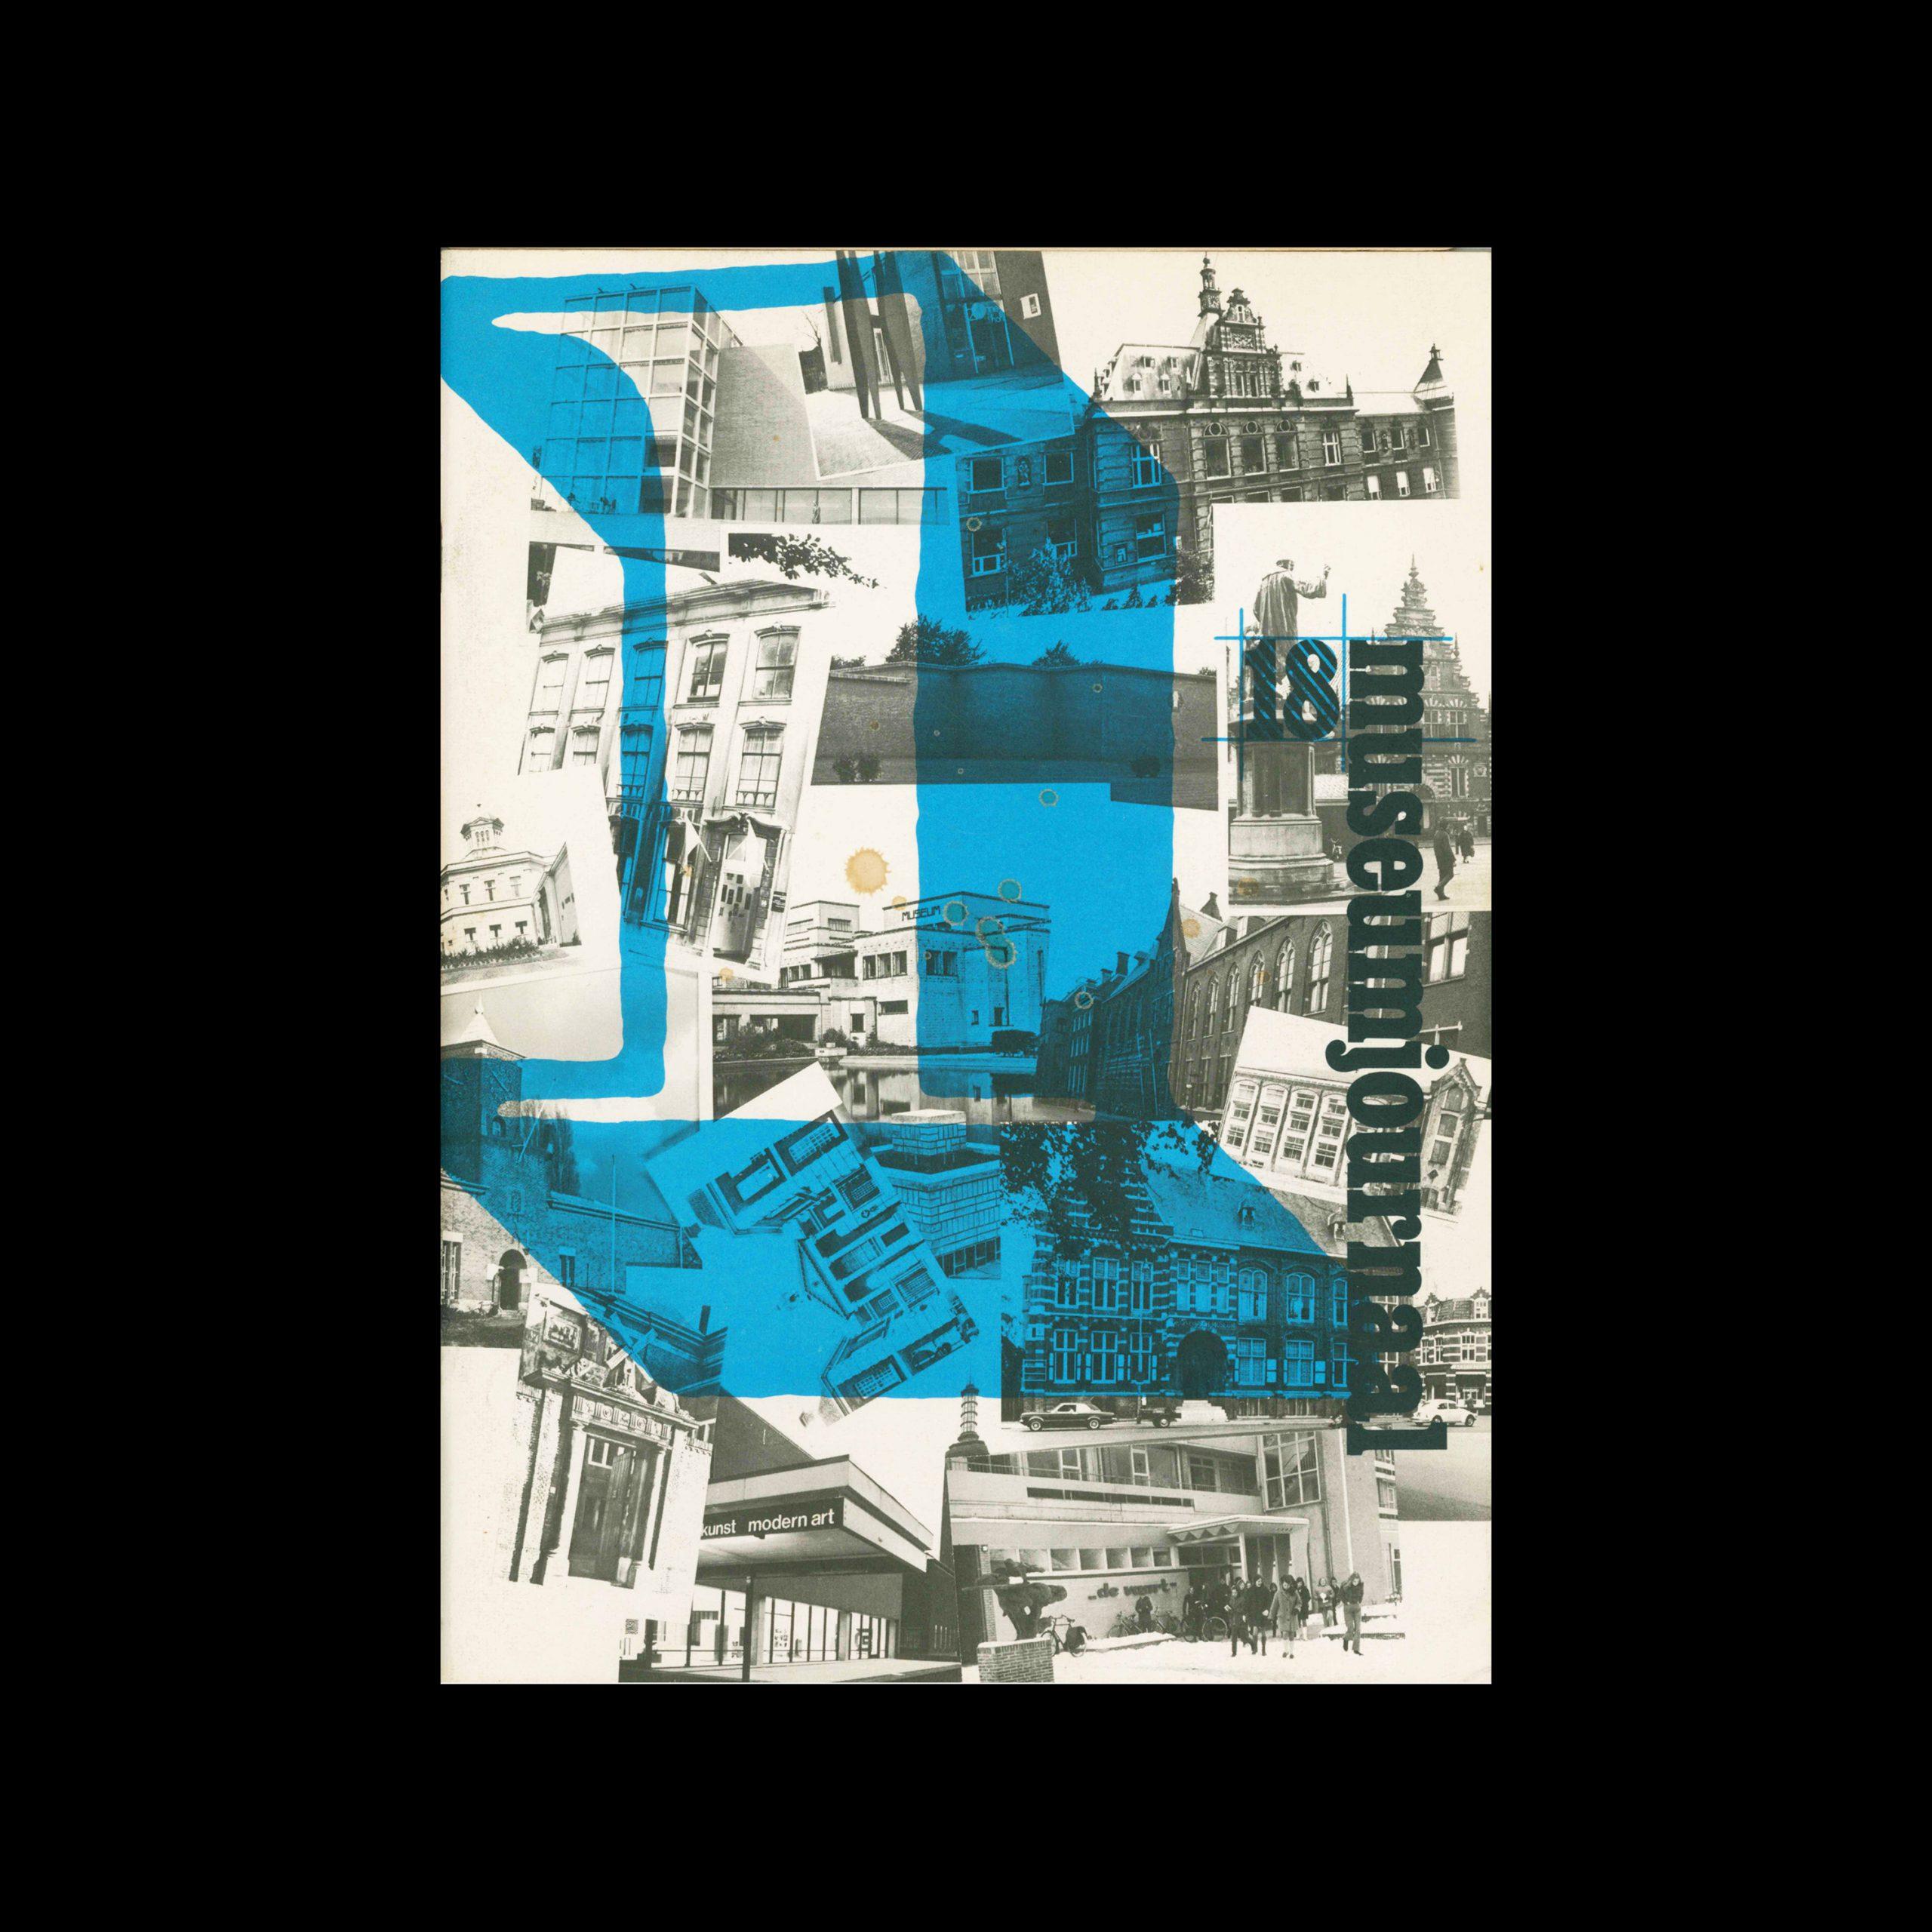 Museumjournaal, Serie 18 no1, 1973. Frank Steenhagen (cover), Jurriaan Schrofer (layout)